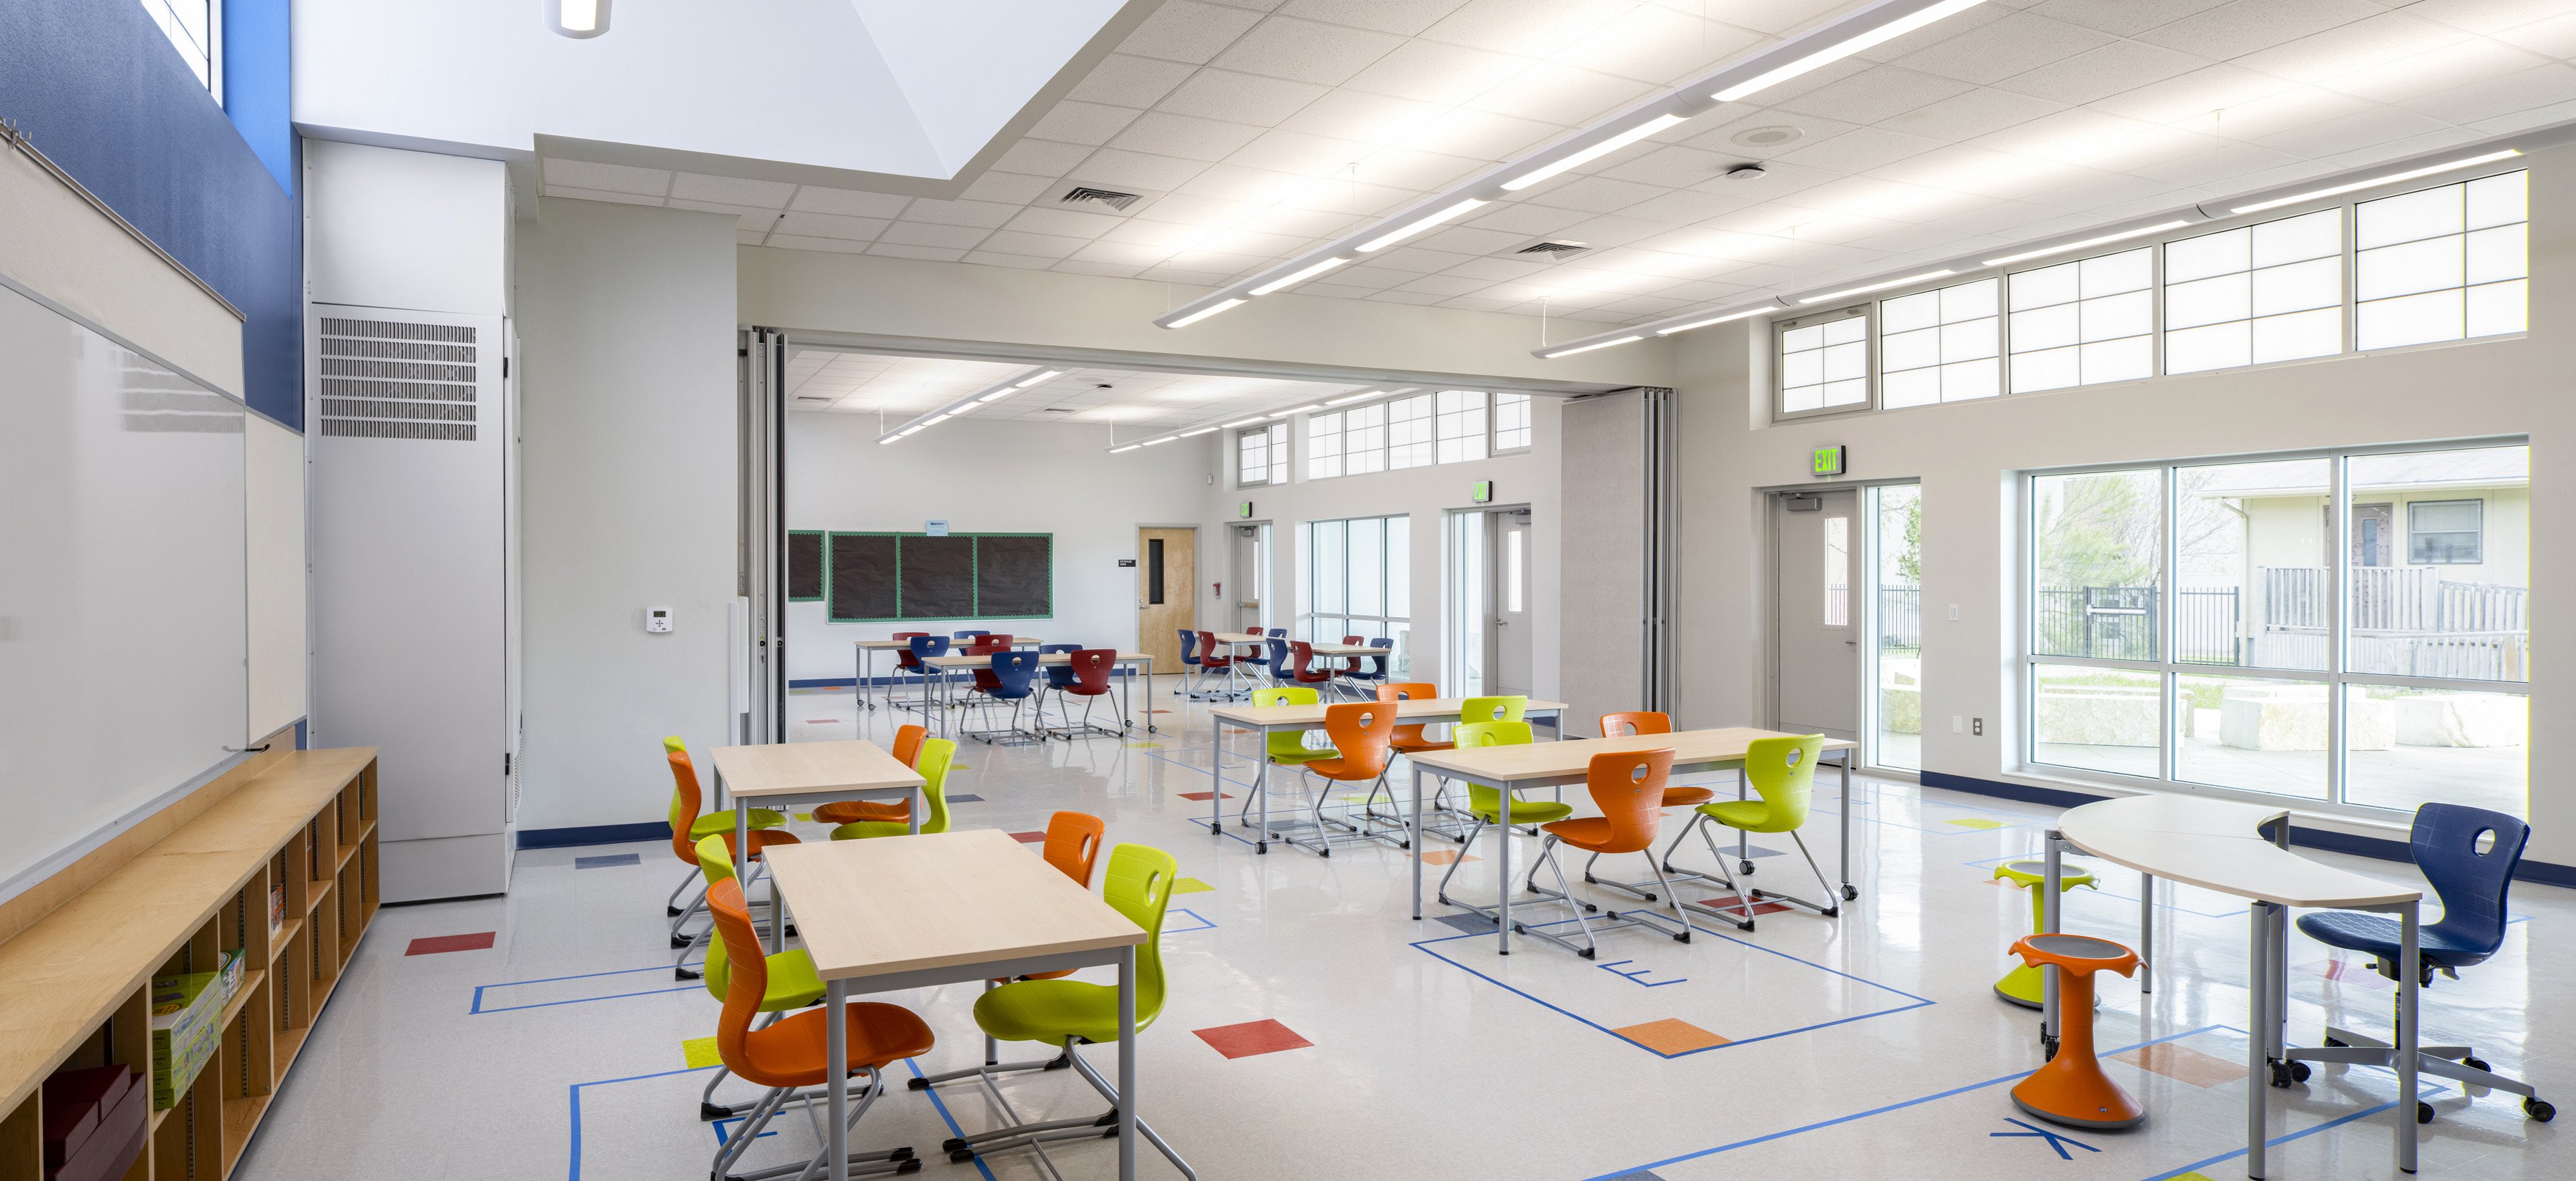 Austin ISD Pickle Elementary School